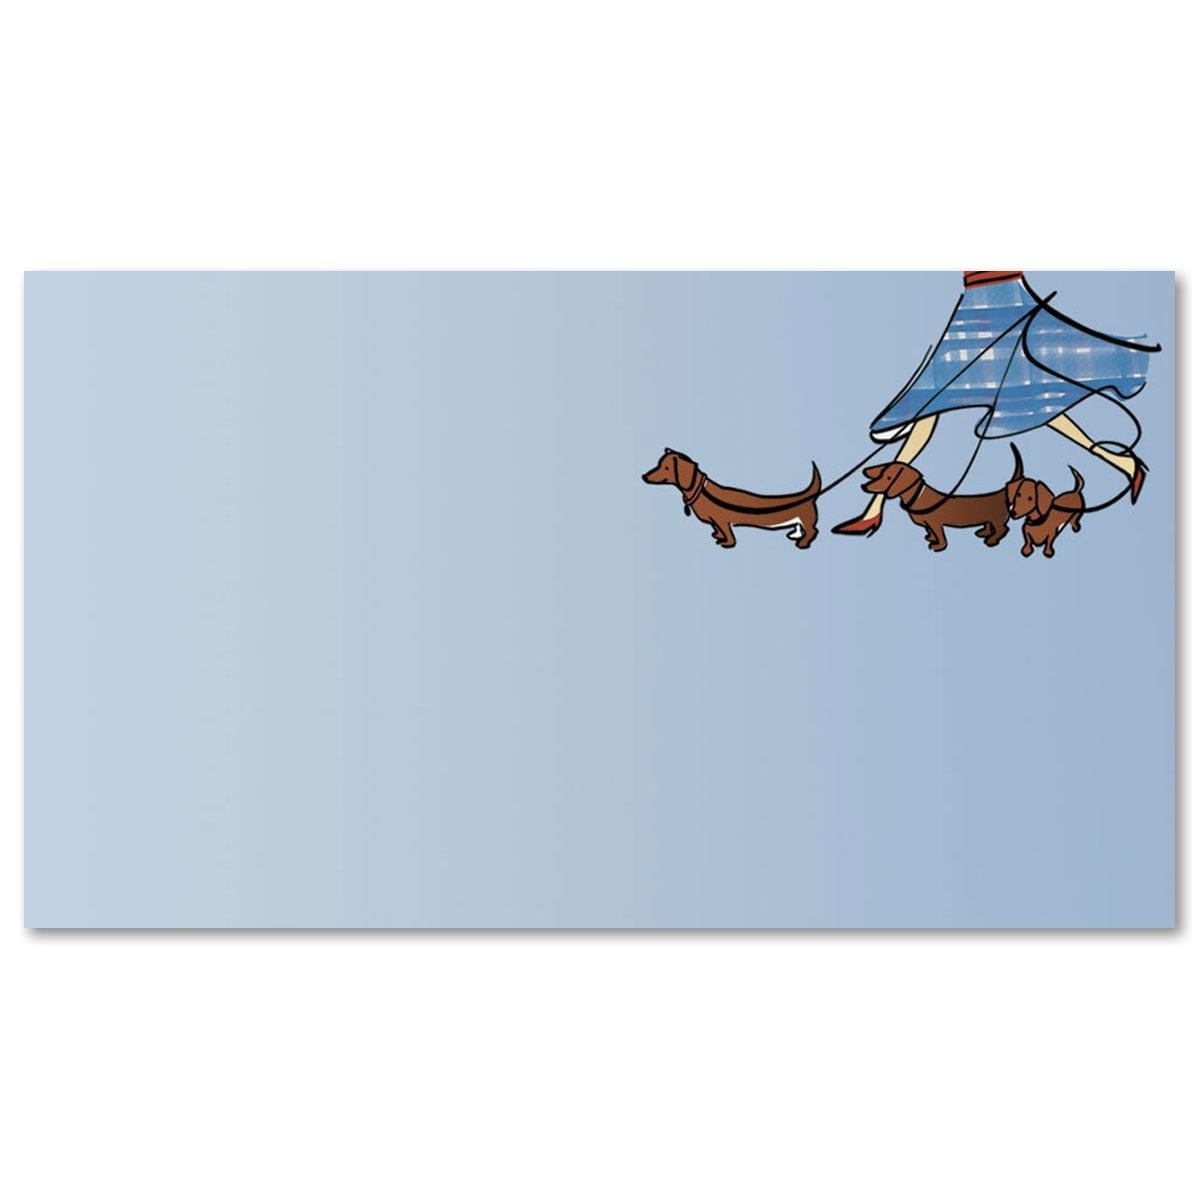 Dog walker business cards paperdirects dog walker business cards colourmoves